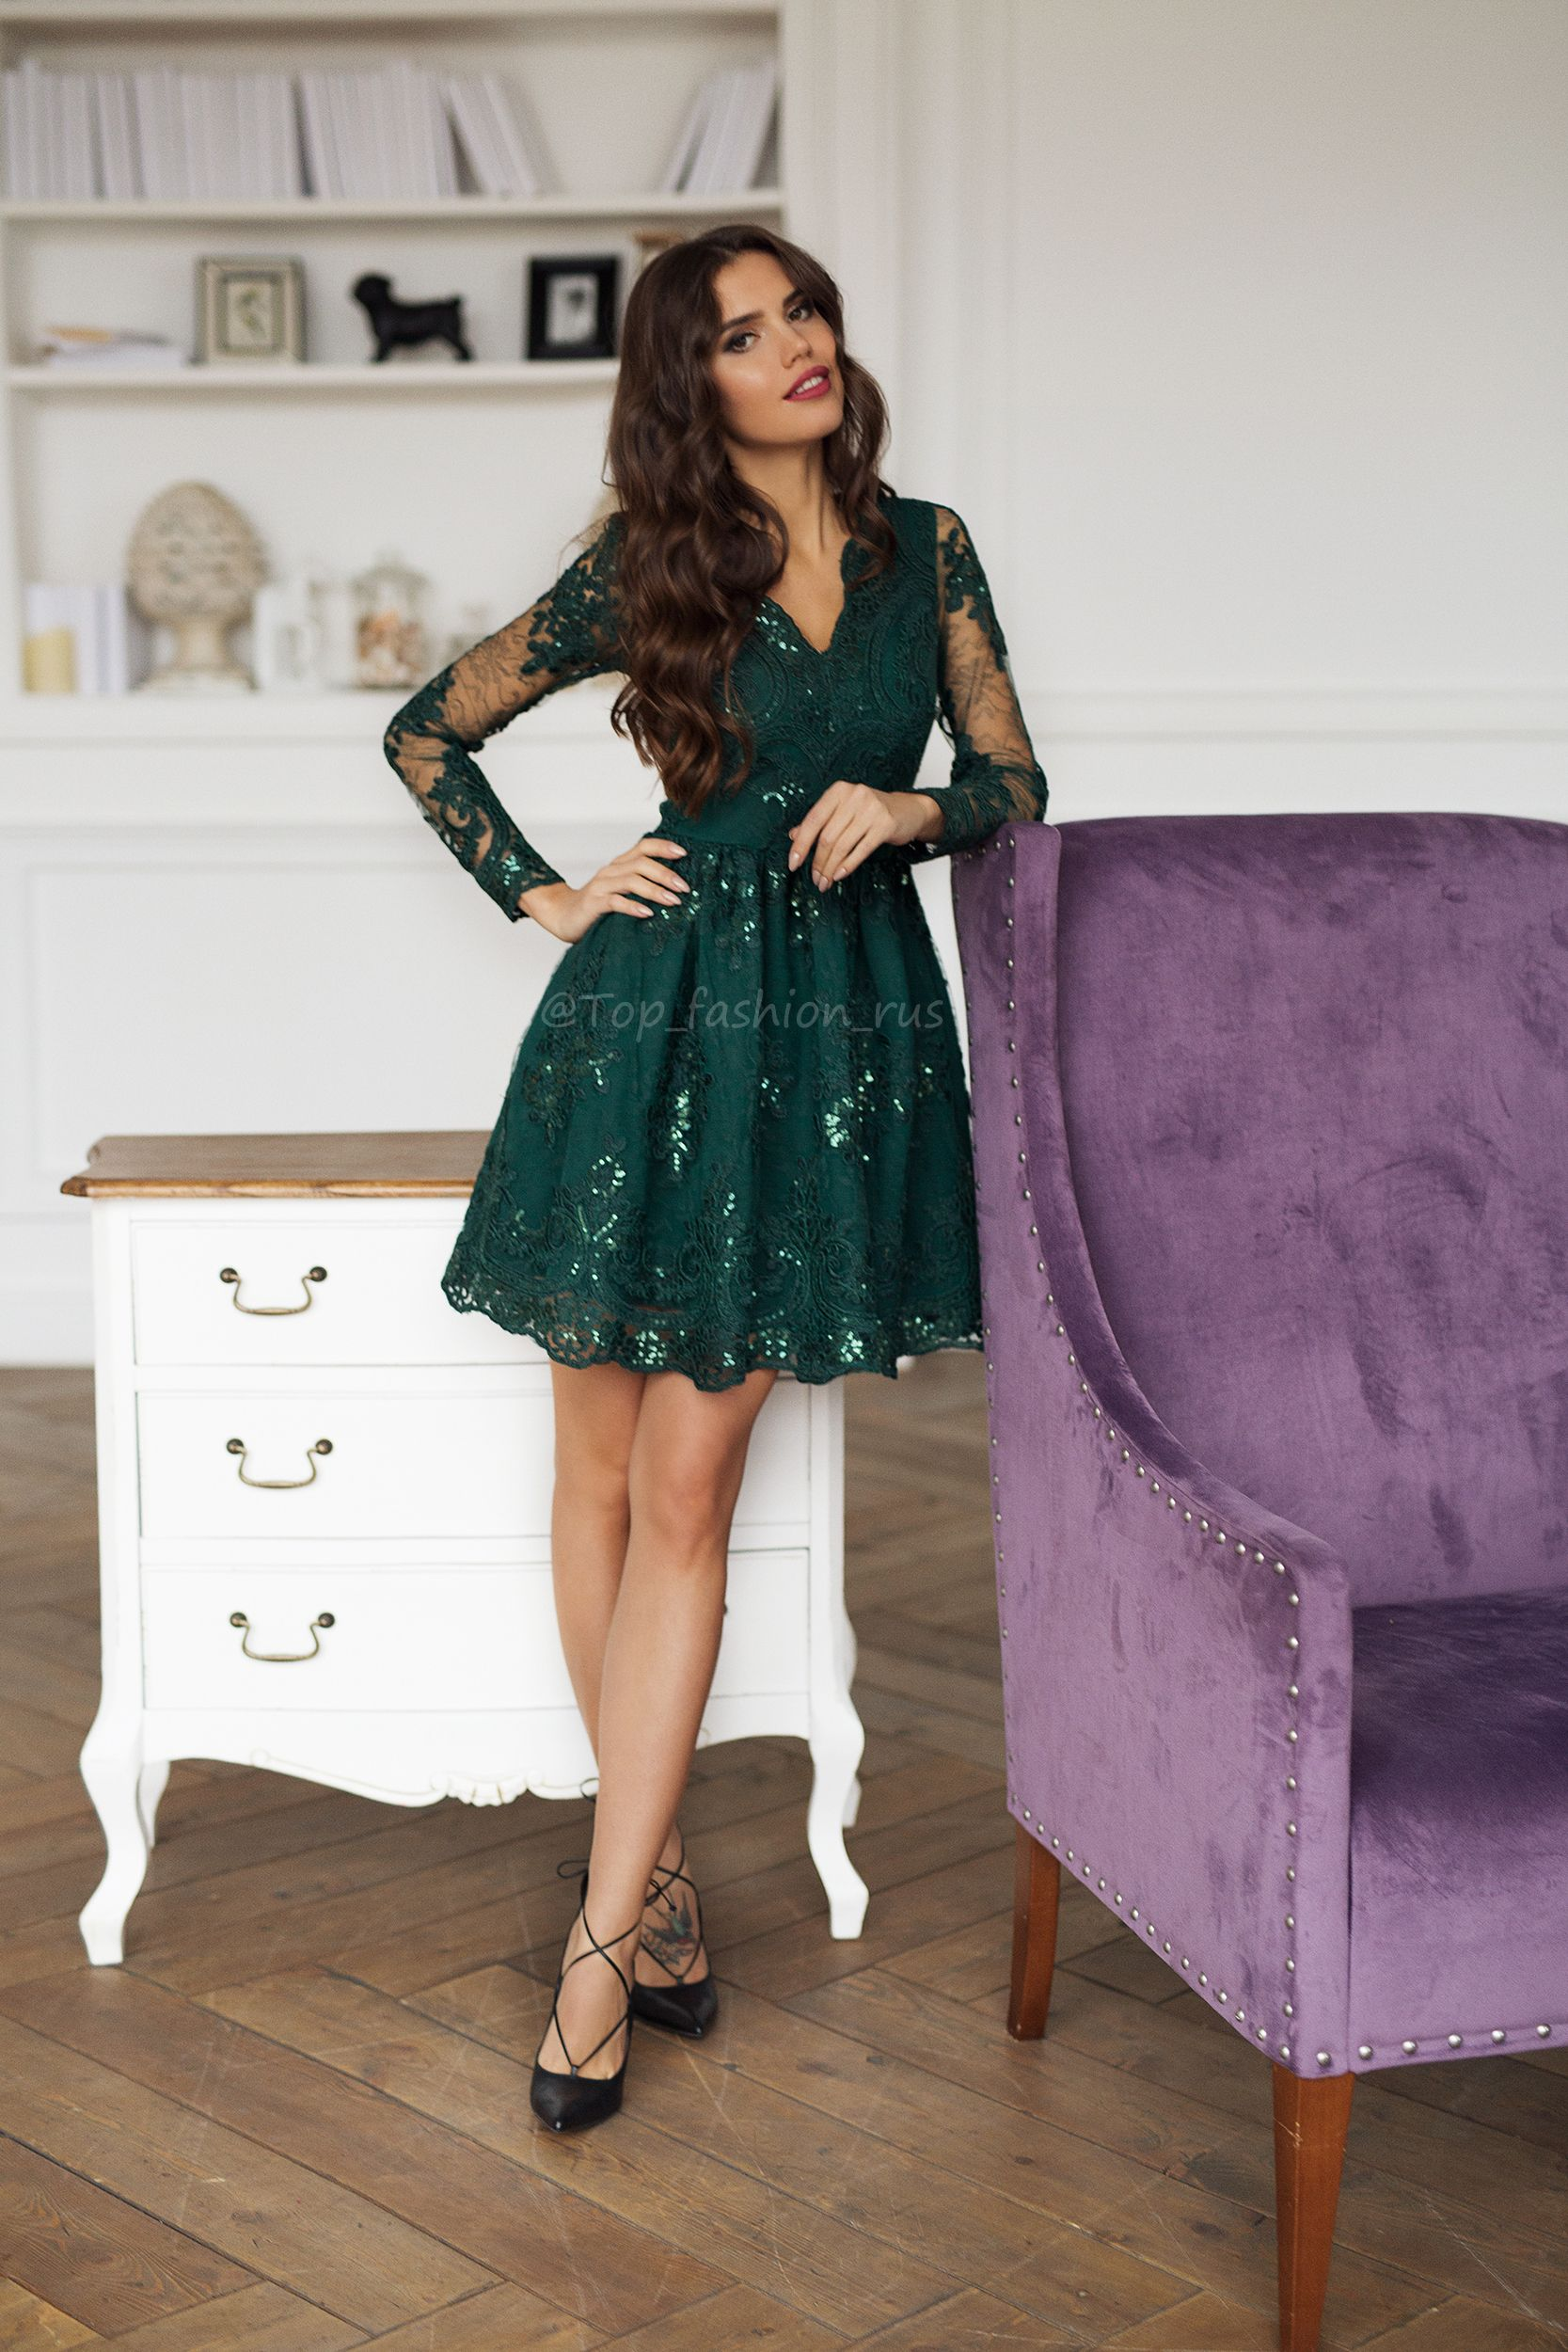 5ad8f6aa1ec4 Зеленое платье, платье, платье на Новый Год, Новогоднее платье 2018 ...